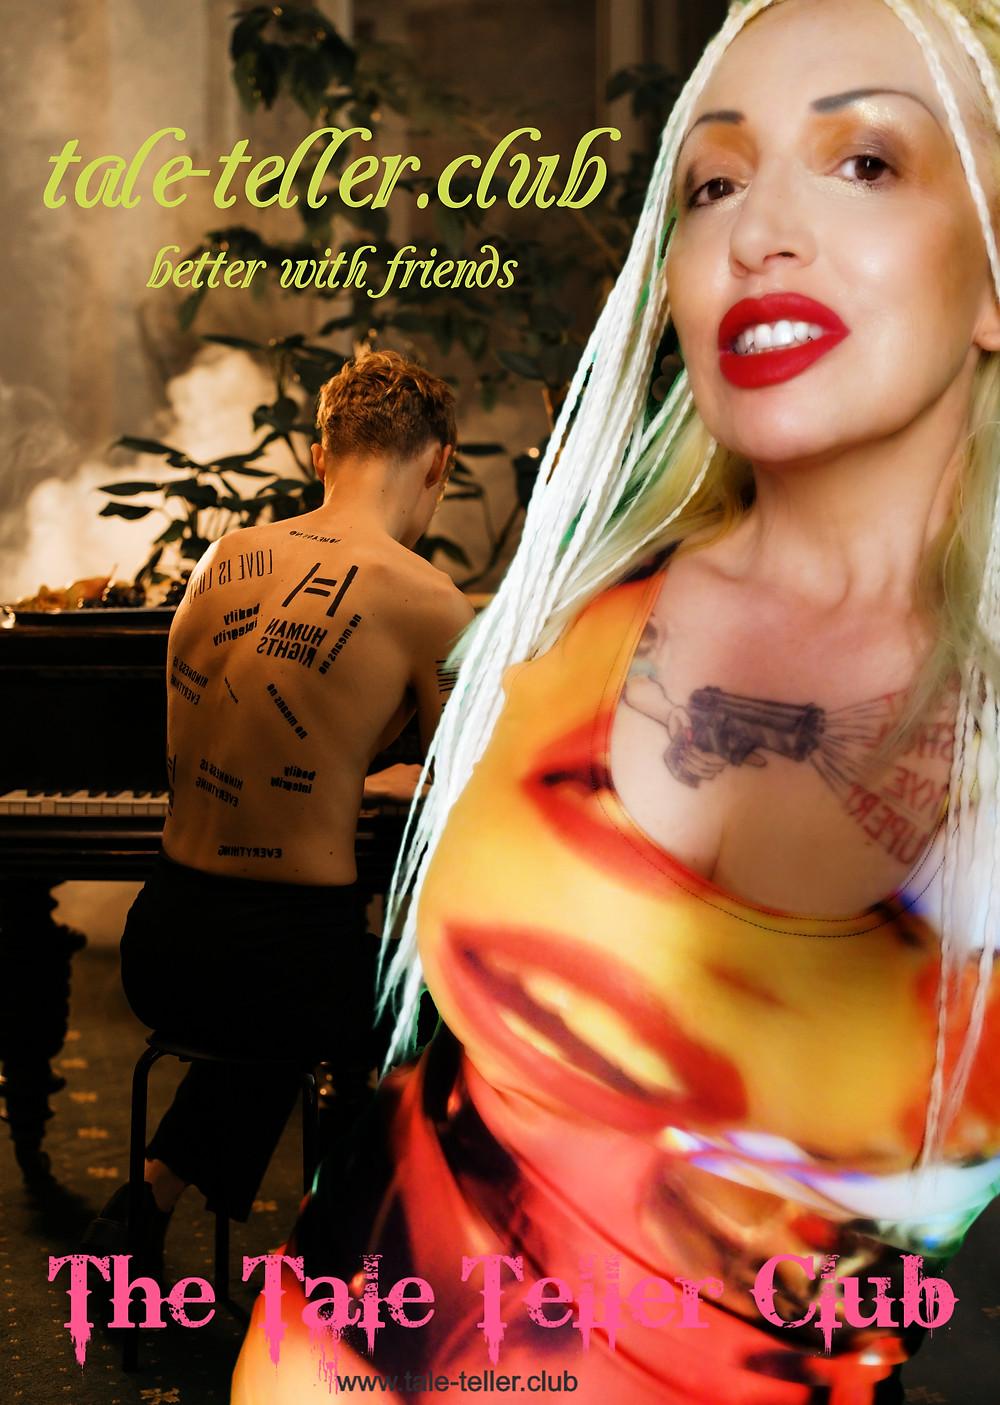 Woman and man playing piano